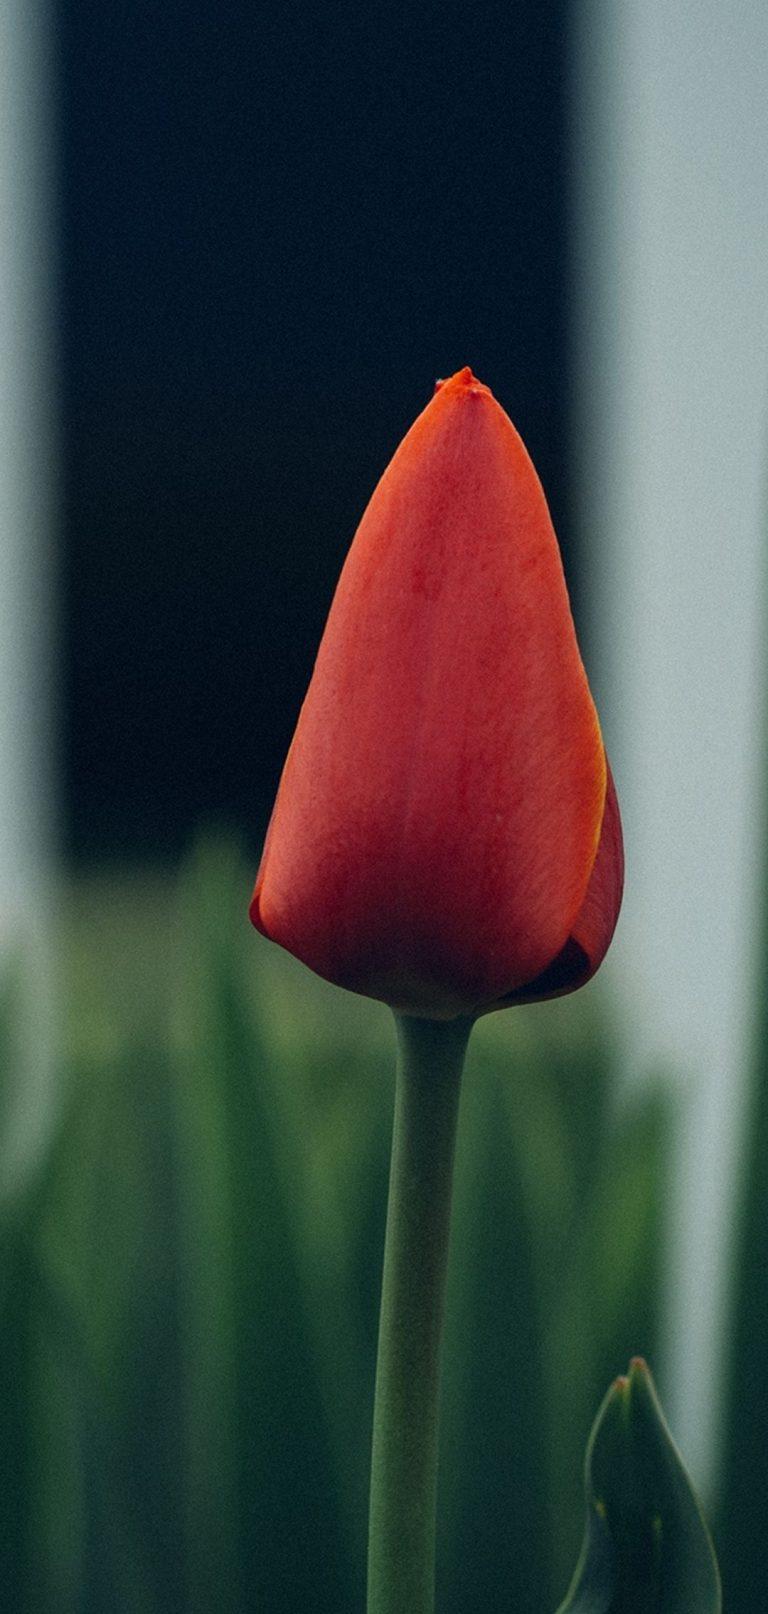 Tulip Flower Bud Blur 1080x2270 768x1614